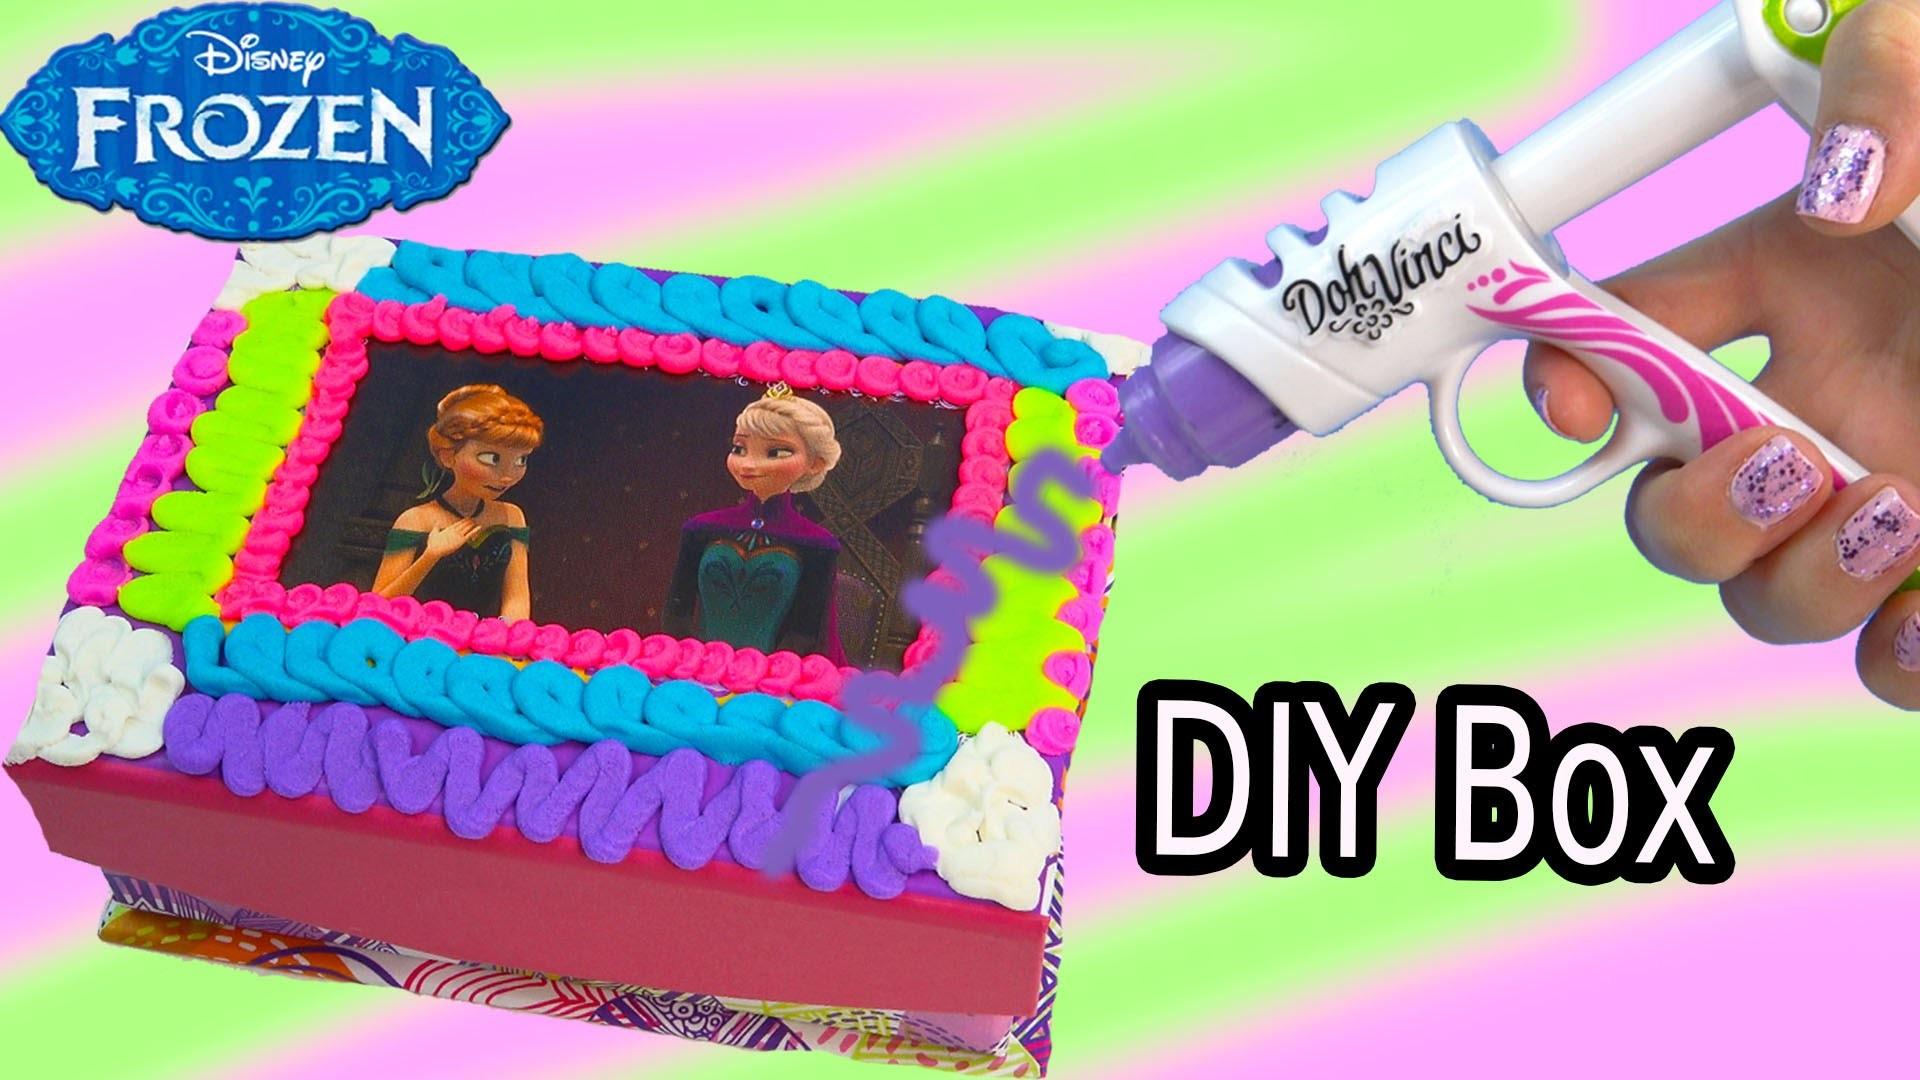 Queen Elsa Princess Anna Playdoh DohVinci DIY Disney Frozen Sticker Box Toy Play Doh Vinci Fun Craft